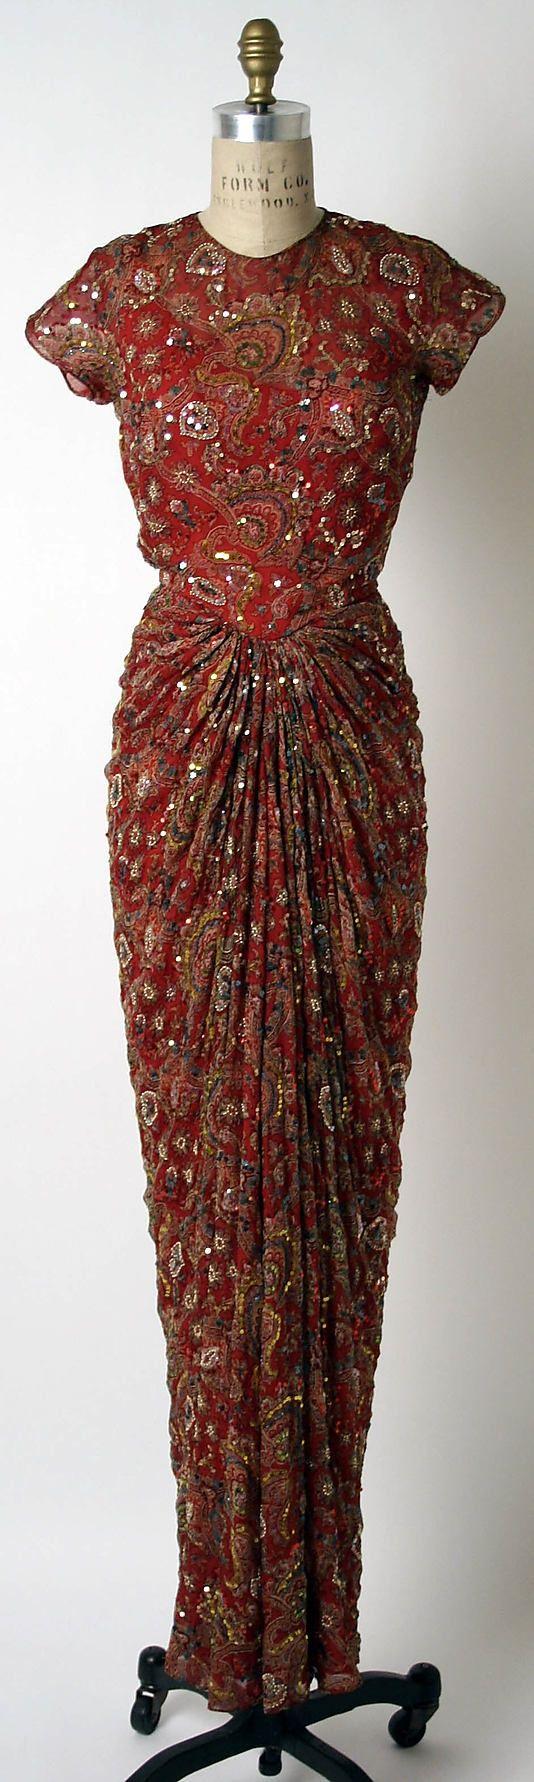 Dress, Evening  James Galanos  (American, born Philadelphia, Pennsylvania, 1924)   silk, synthetic pearl, plastic  From the Metropolitan Museum of Art